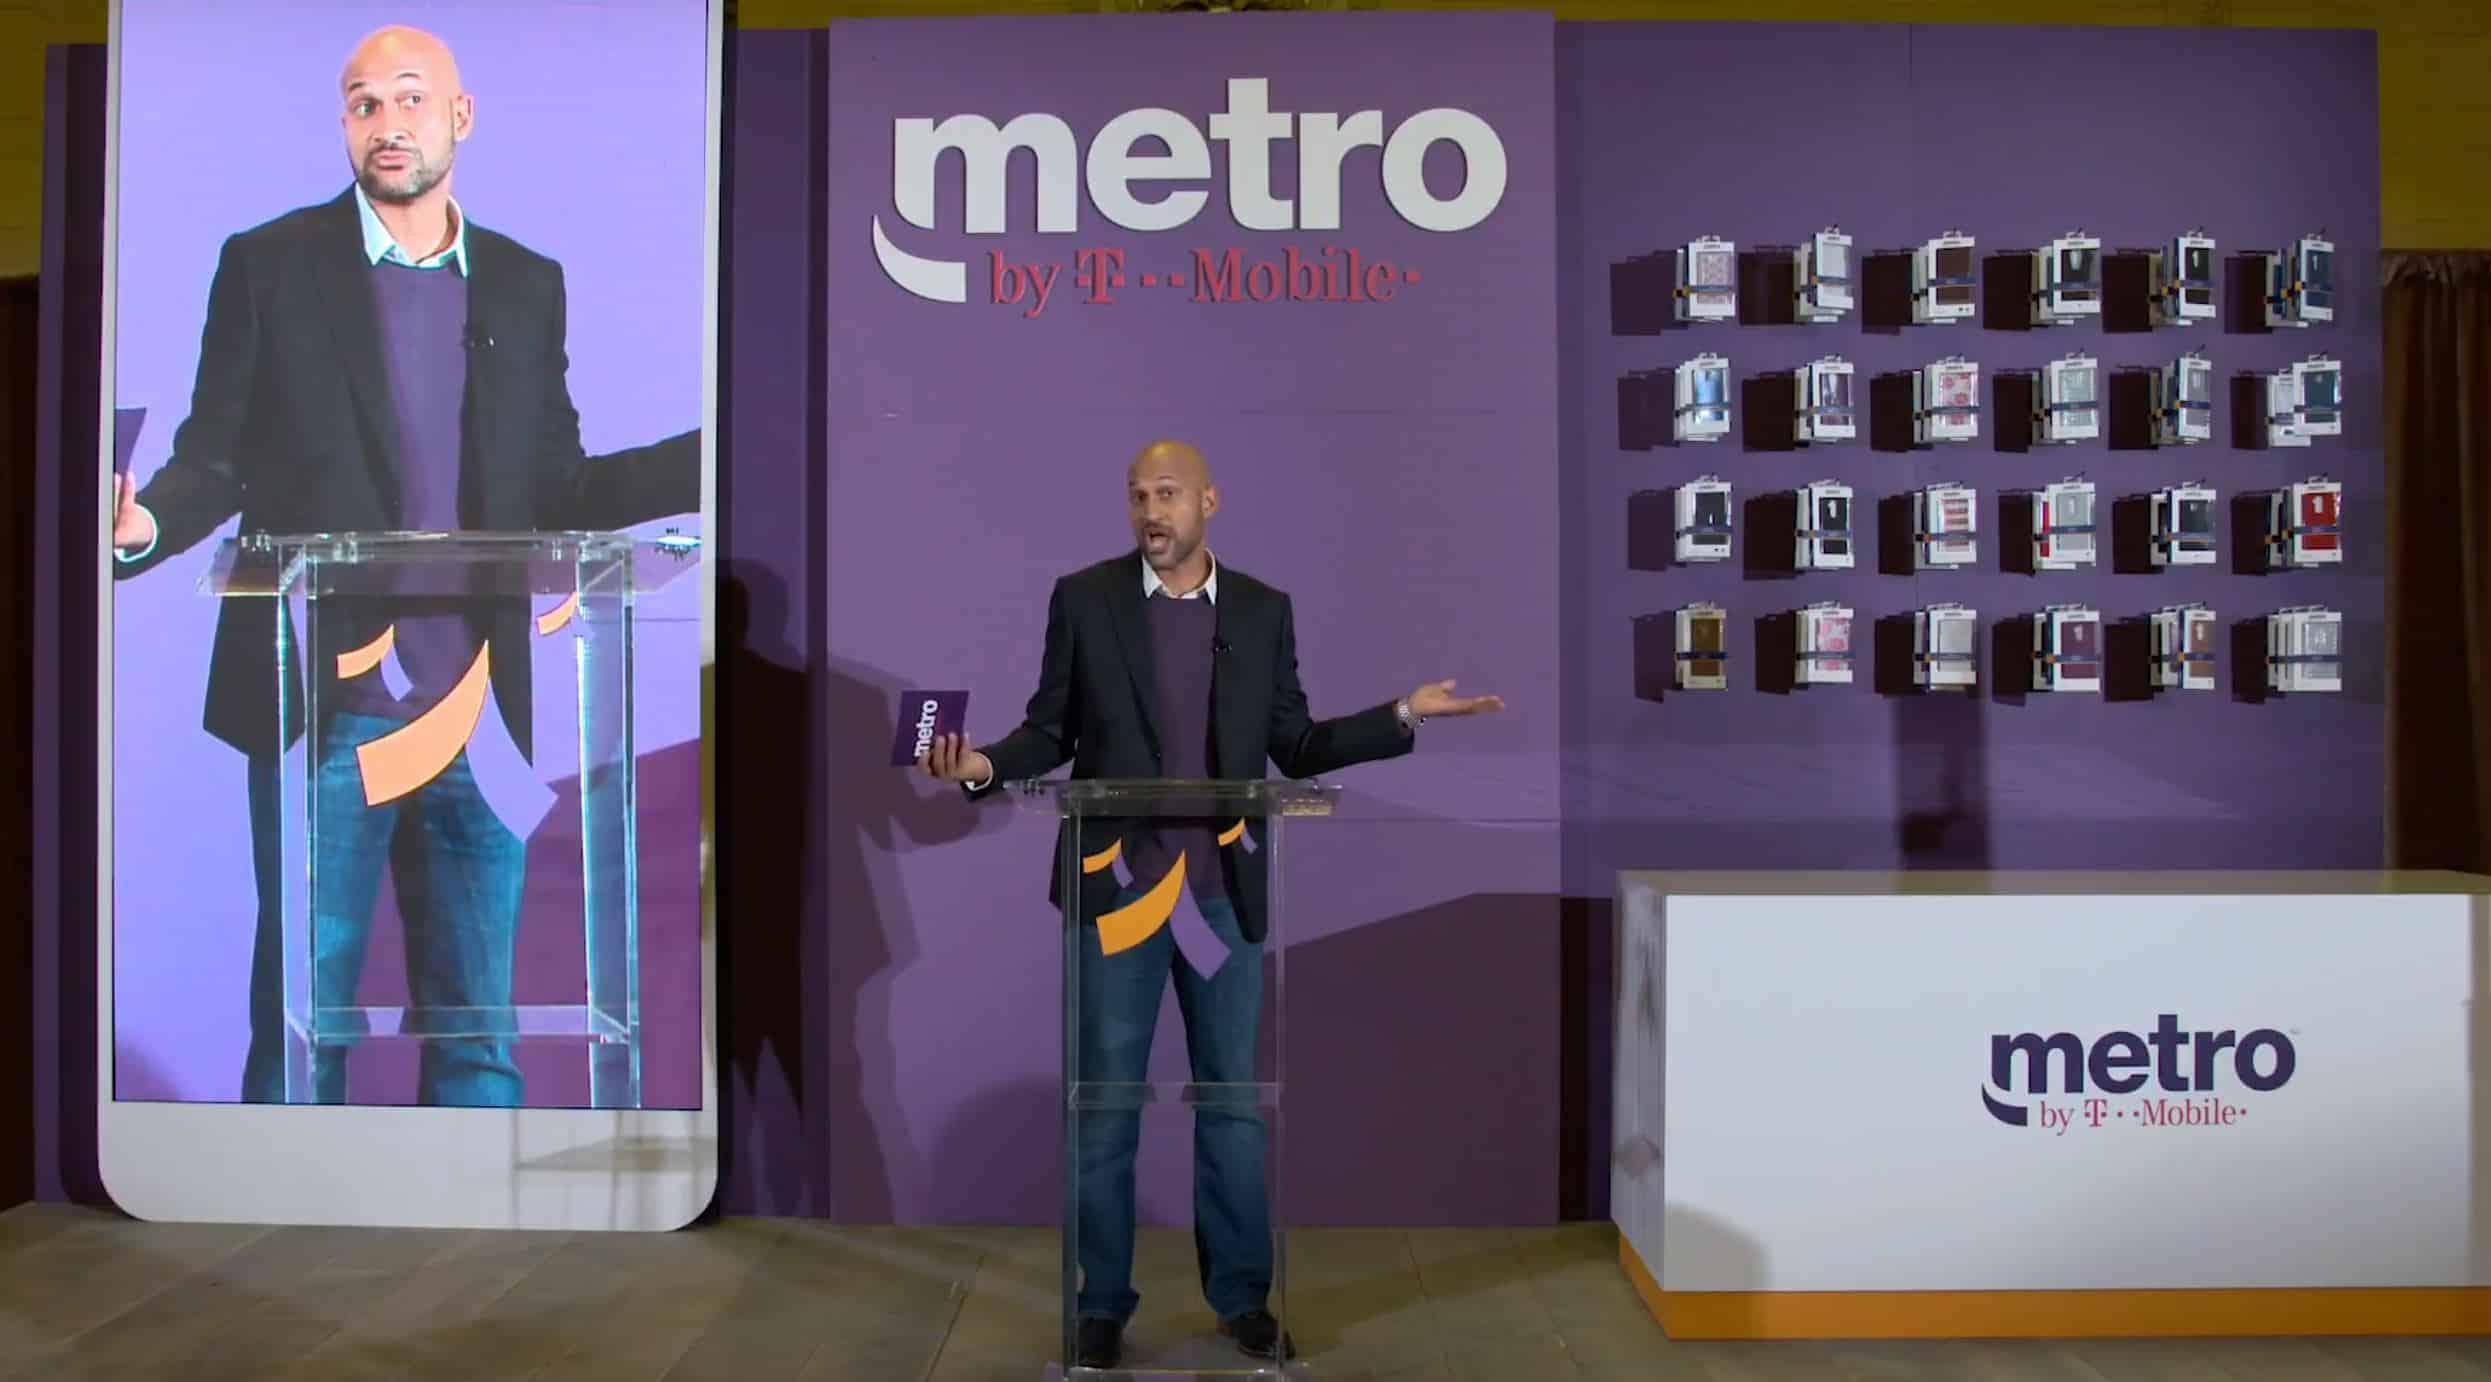 Metro By T Mobile KMK October 8 2018 YouTube